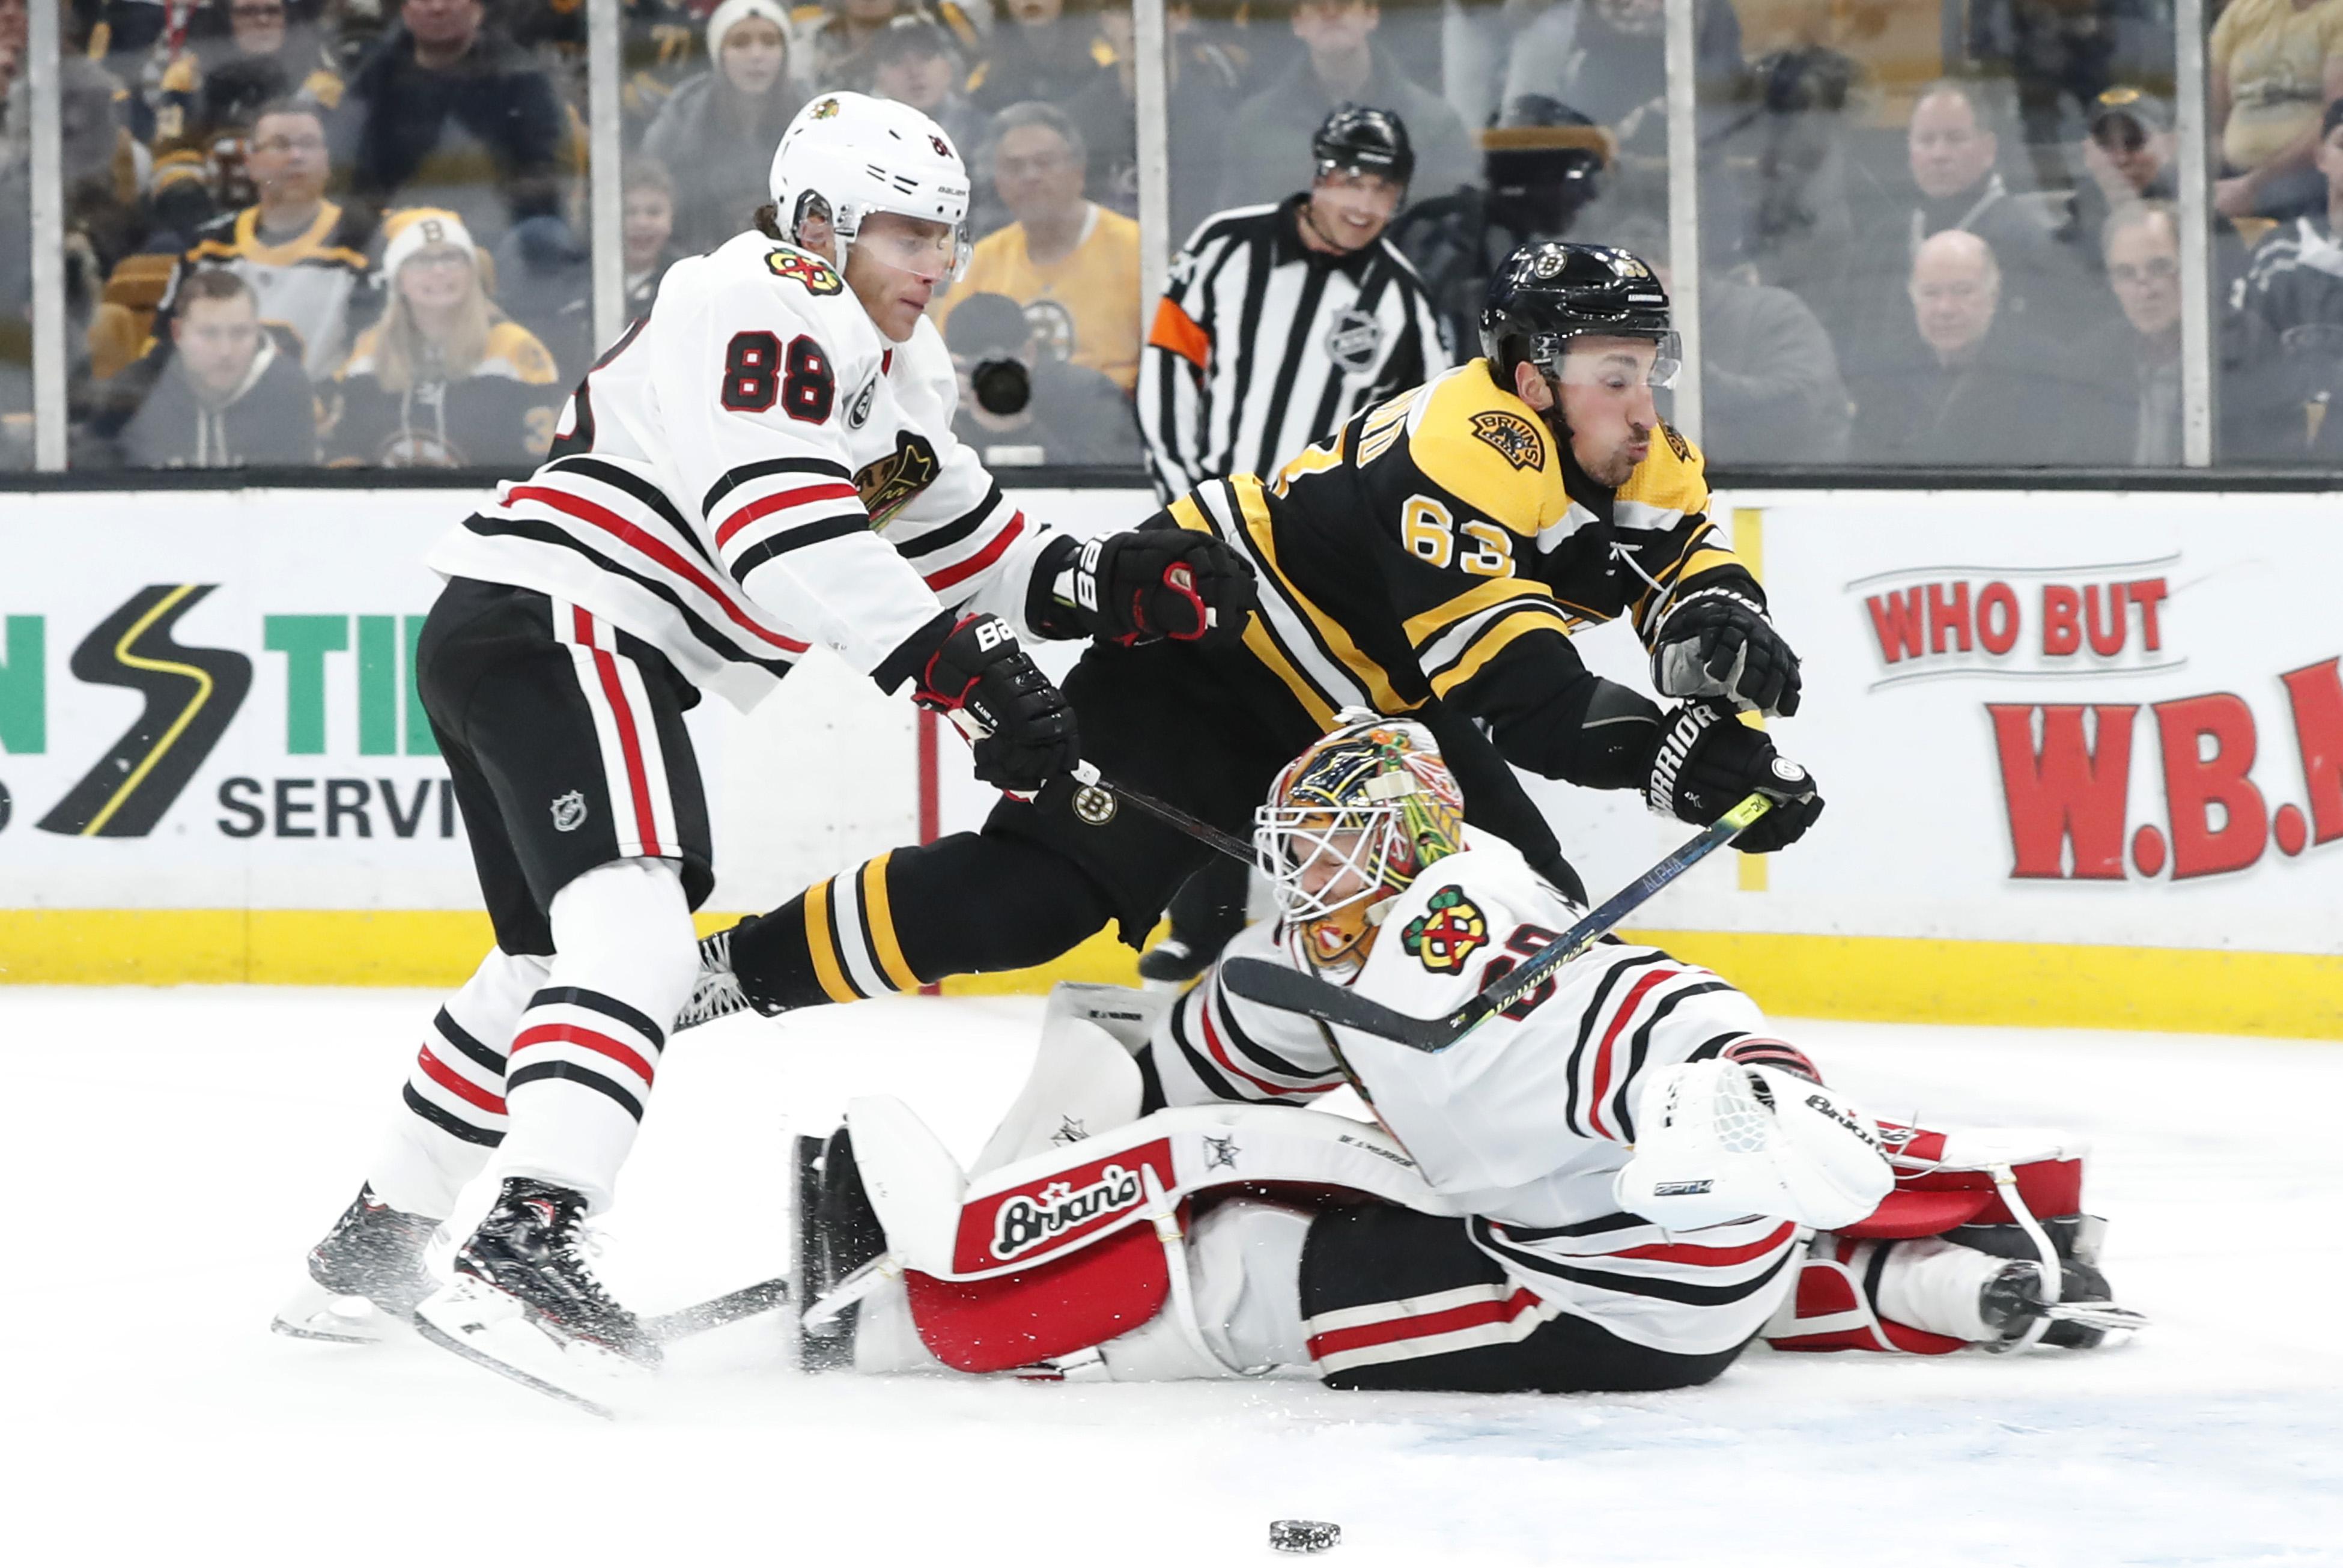 NHL: FEB 12 Blackhawks at Bruins